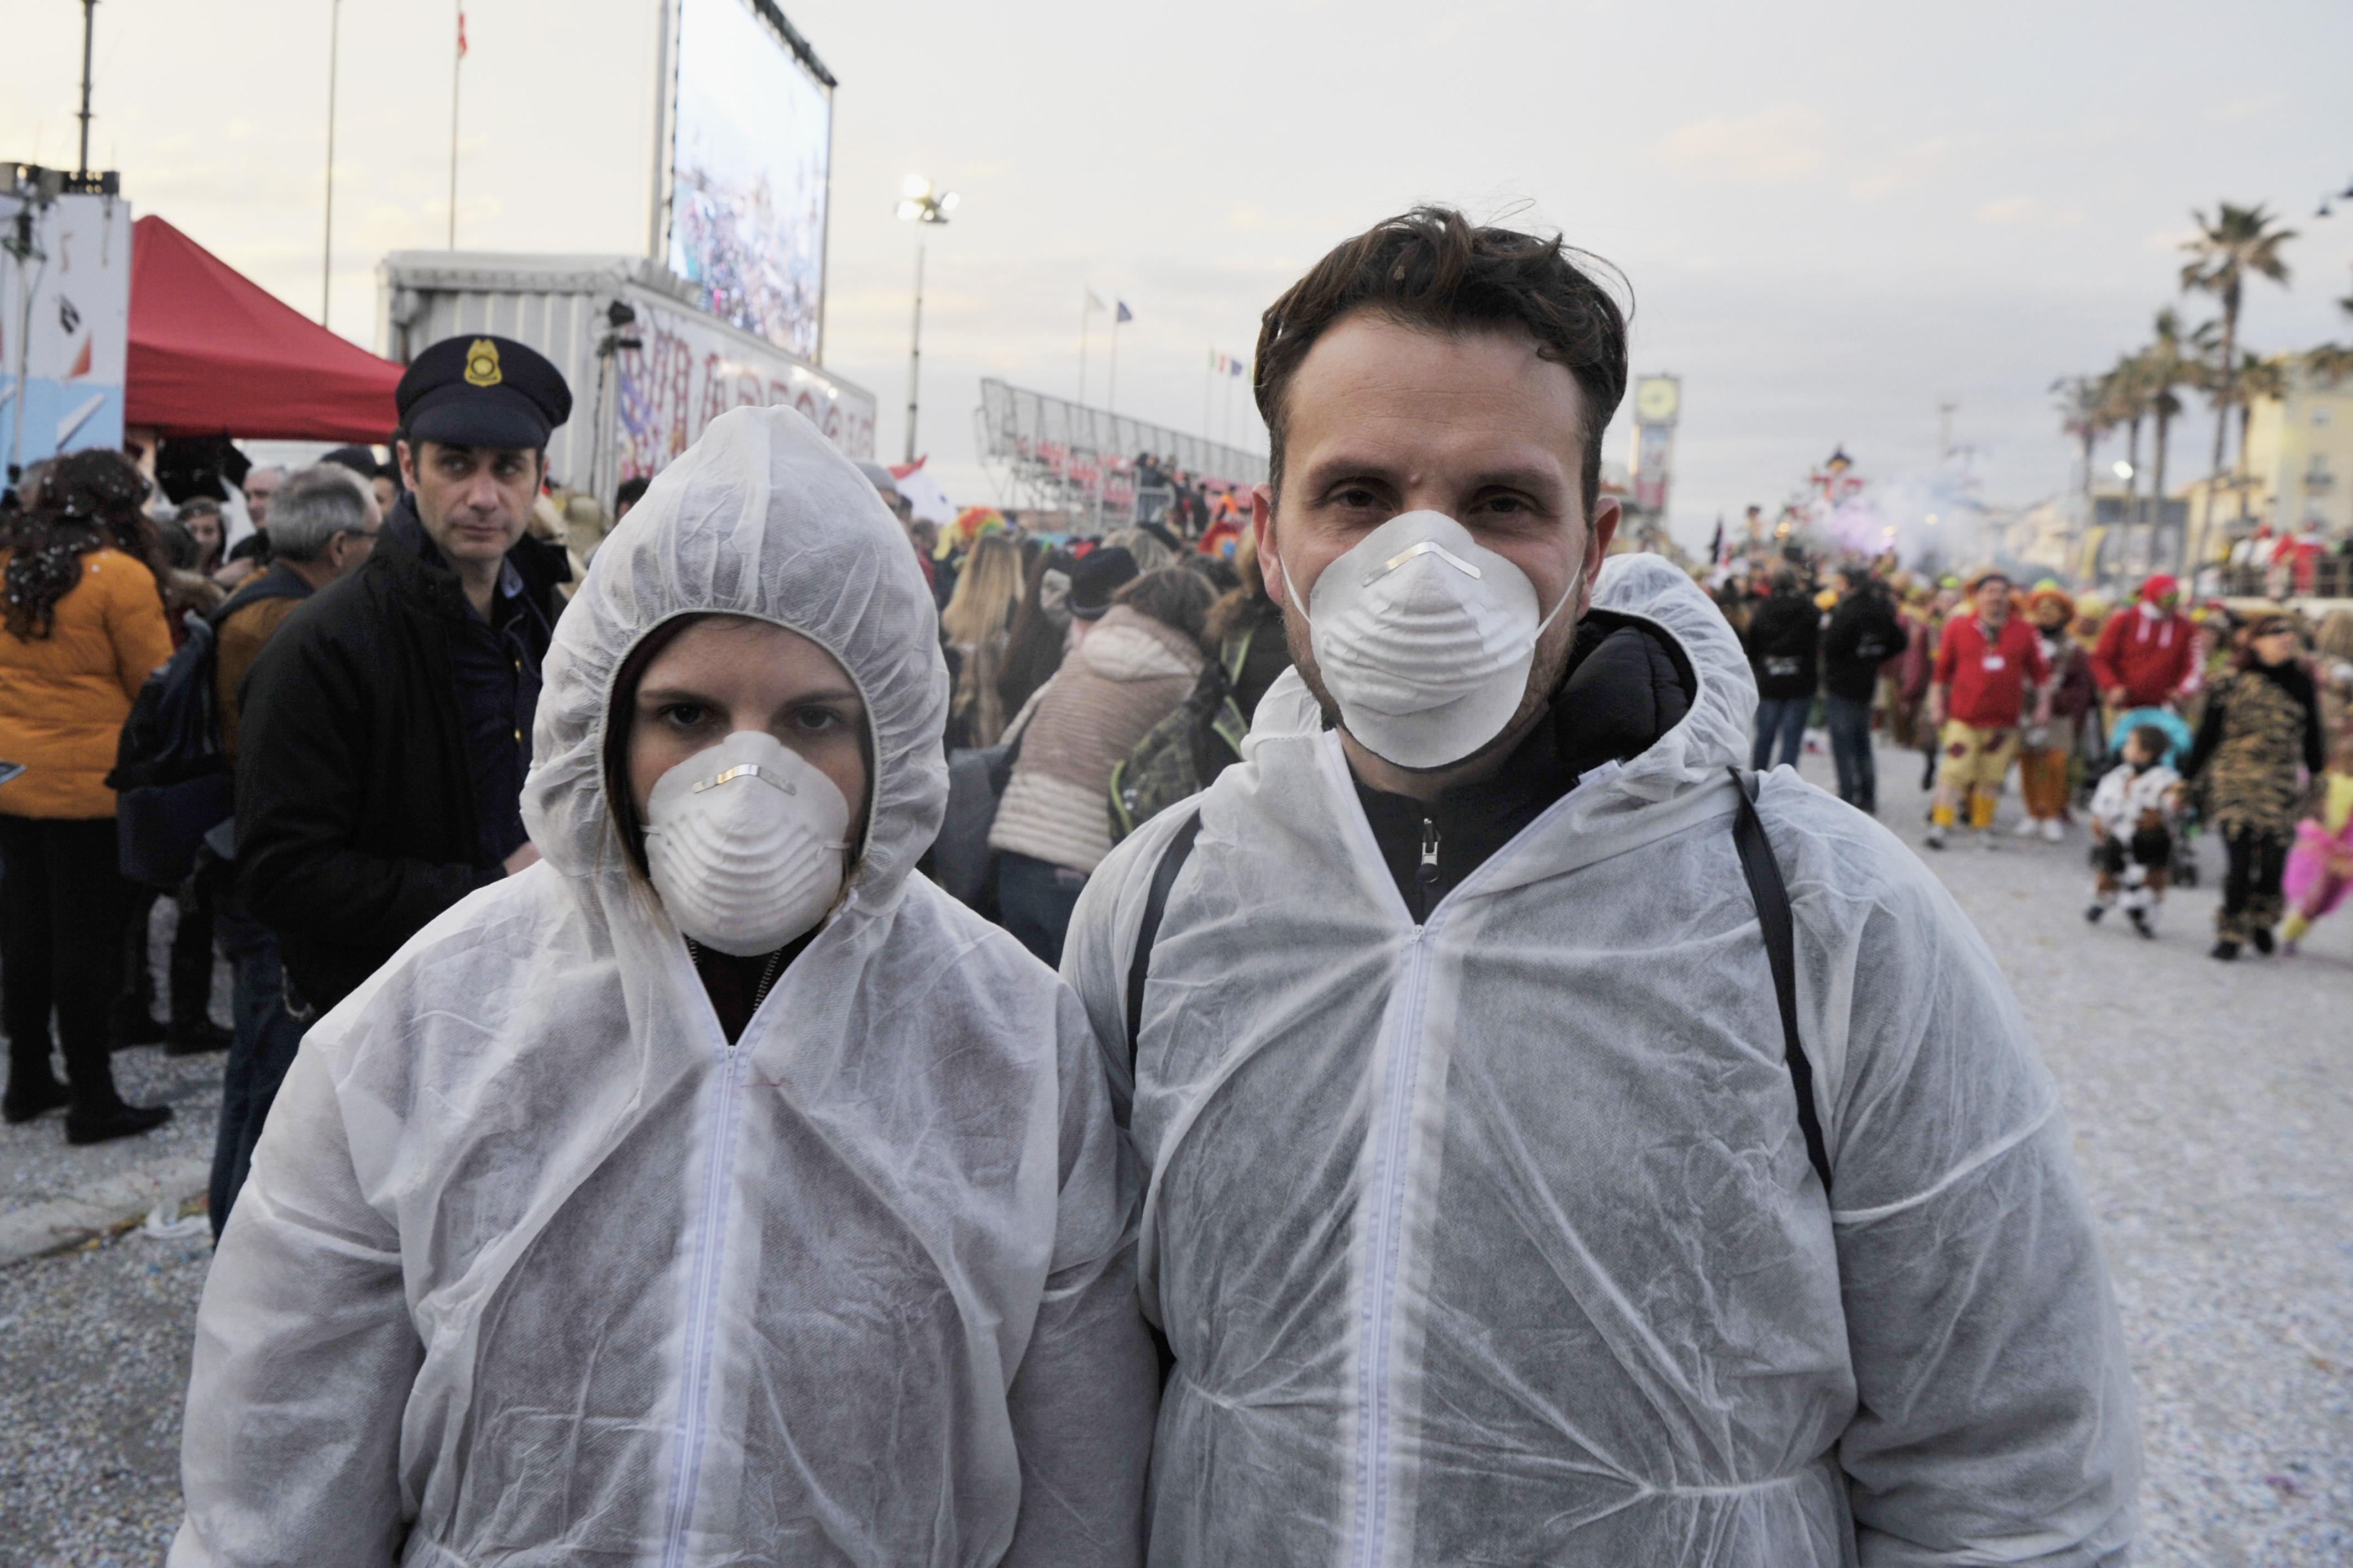 The coronavirus crisis spread to new markets, including Italy ...